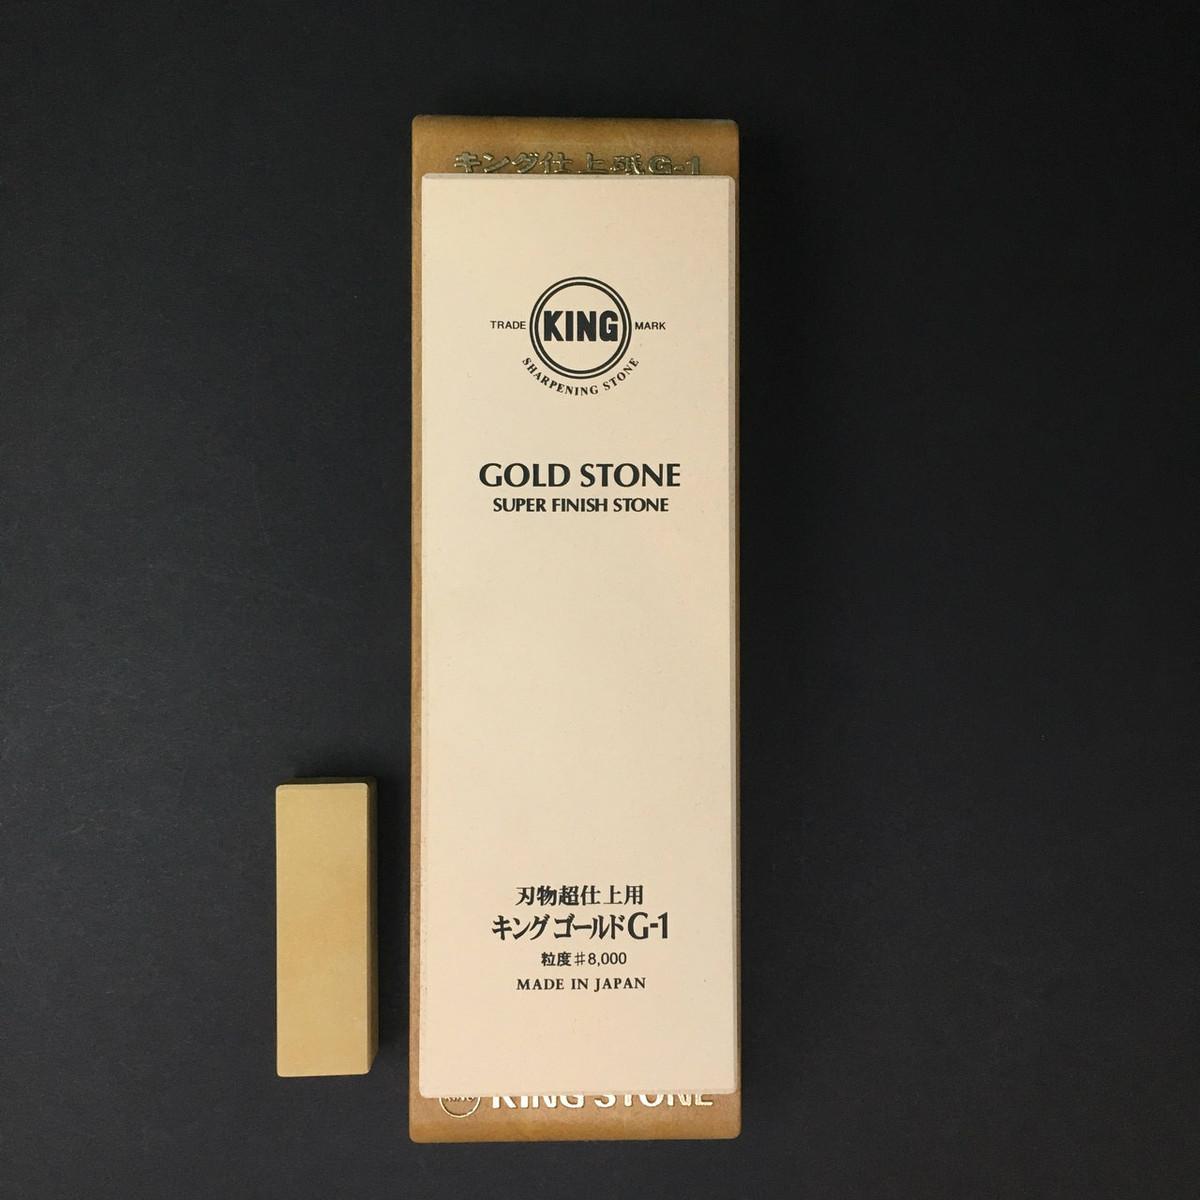 King - Gold Stone - #8000